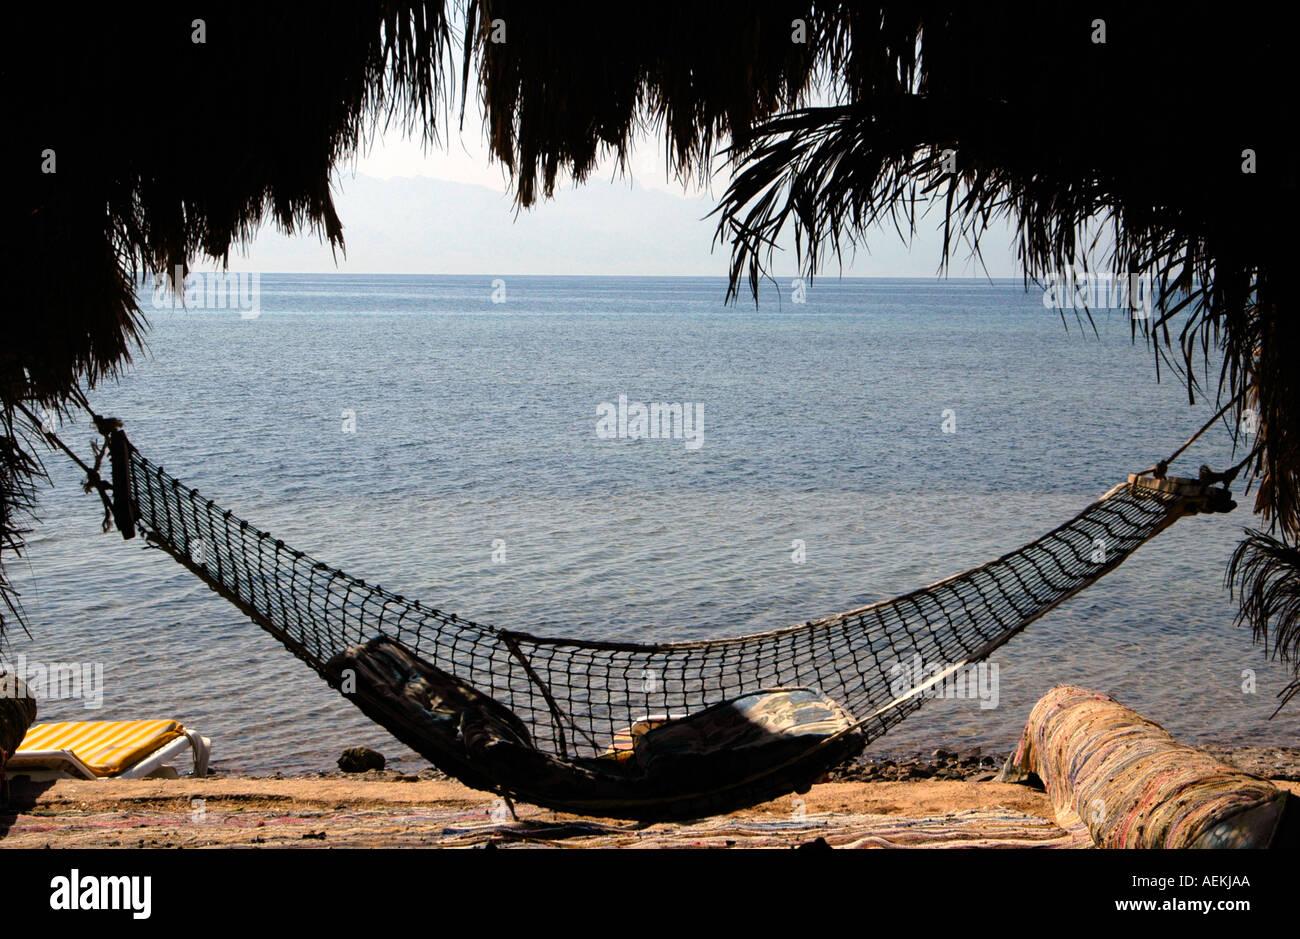 A hammock in Nuweiba Tarabin beach in Nuweiba also spelled: Nueiba a coastal town in the eastern part of Sinai Peninsula, Egypt - Stock Image